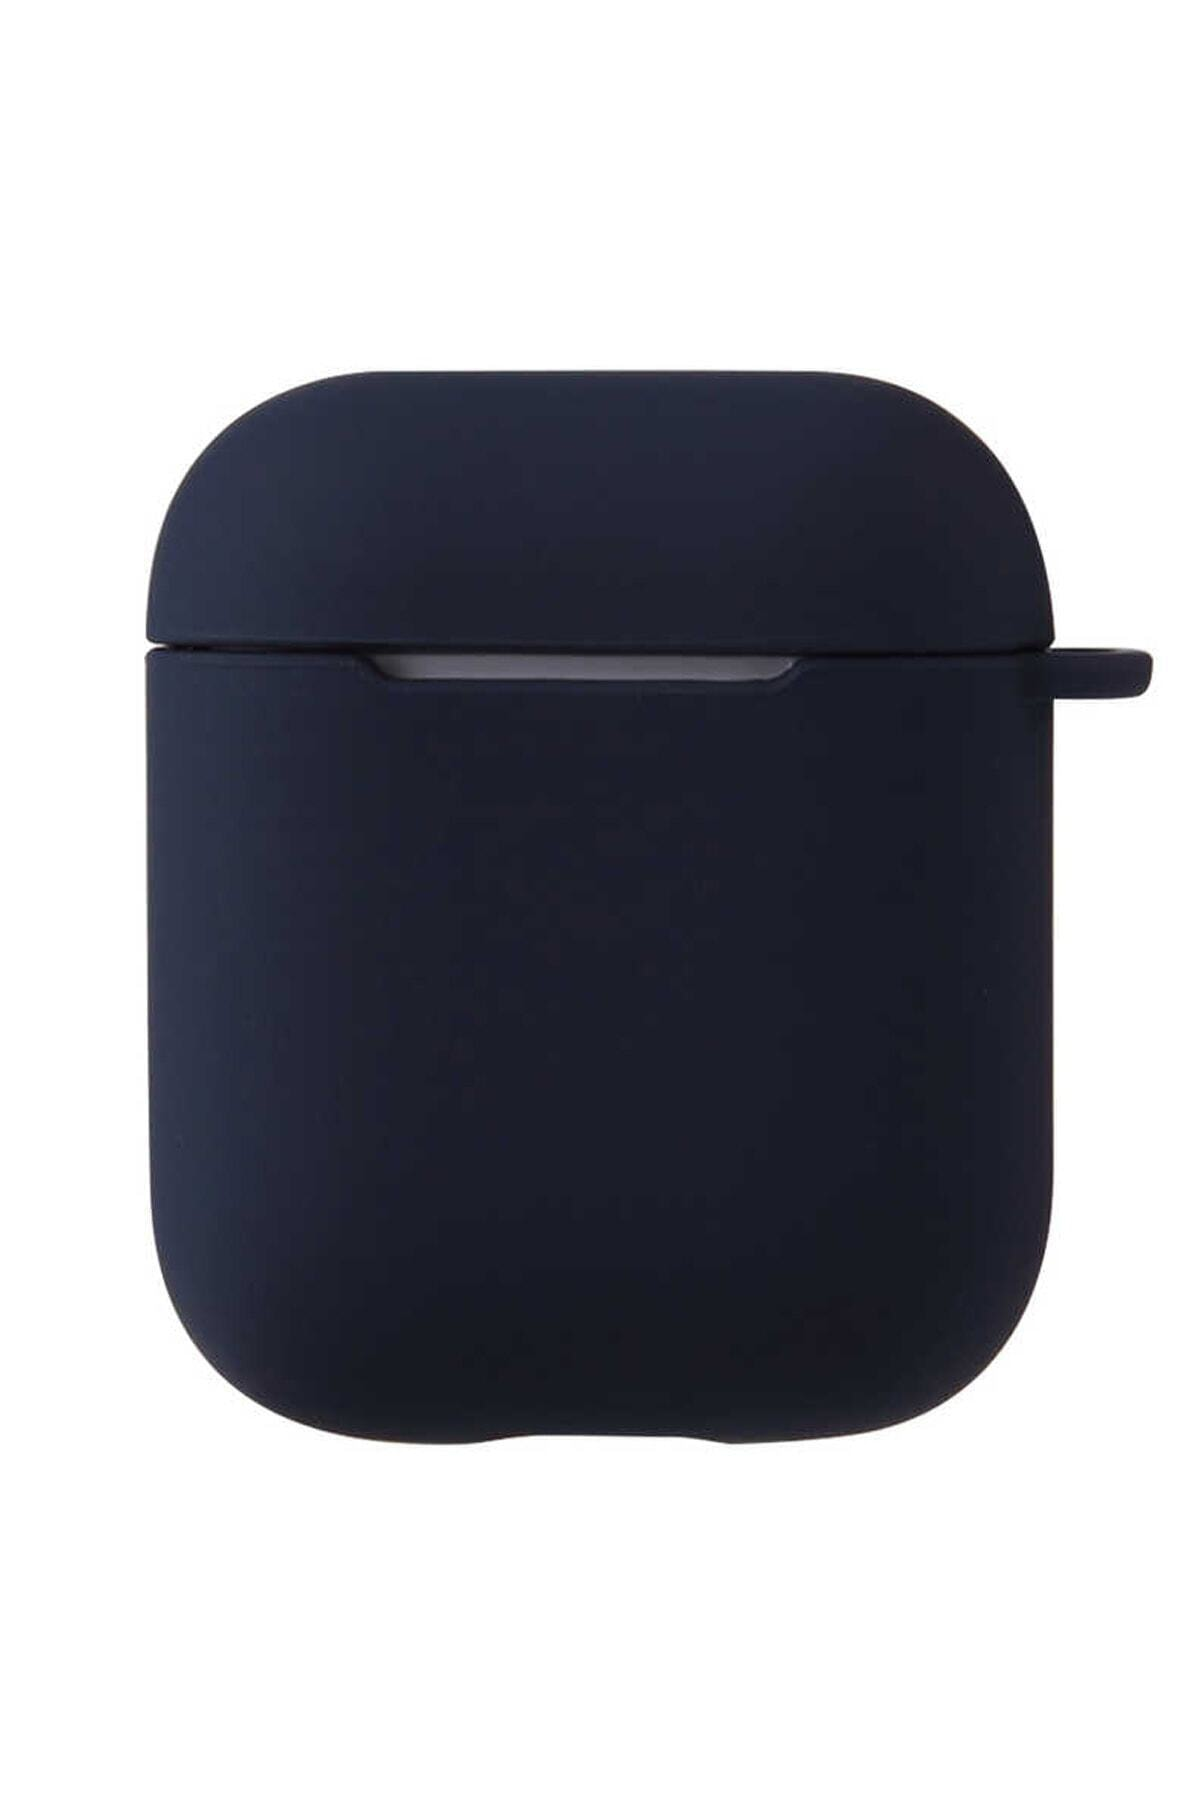 Sunix Airpods 2. Nesil Uyumlu Kılıf Pastel Renkli Silikon Koruma Kopçalı Siyah 1